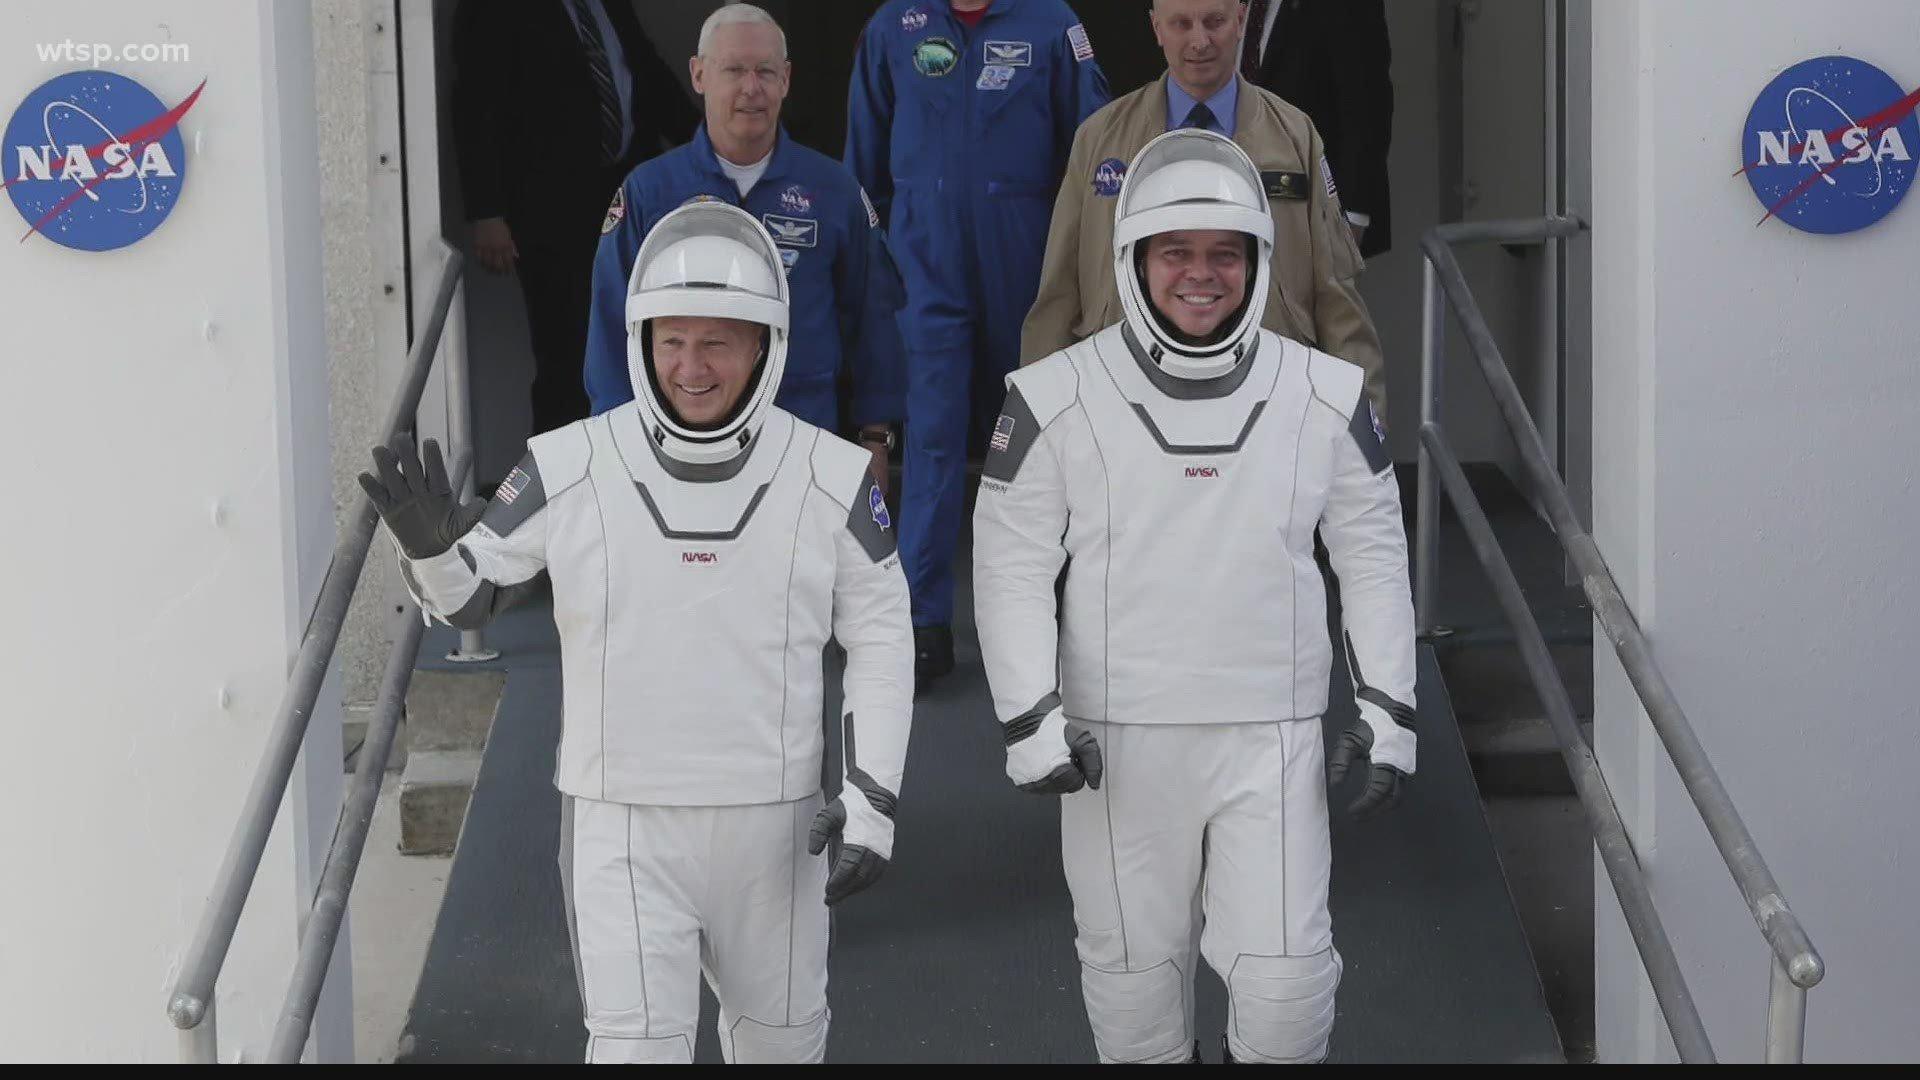 NASA SpaceX Crew Dragon Demo 2 crewed launch wtspcom 1920x1080